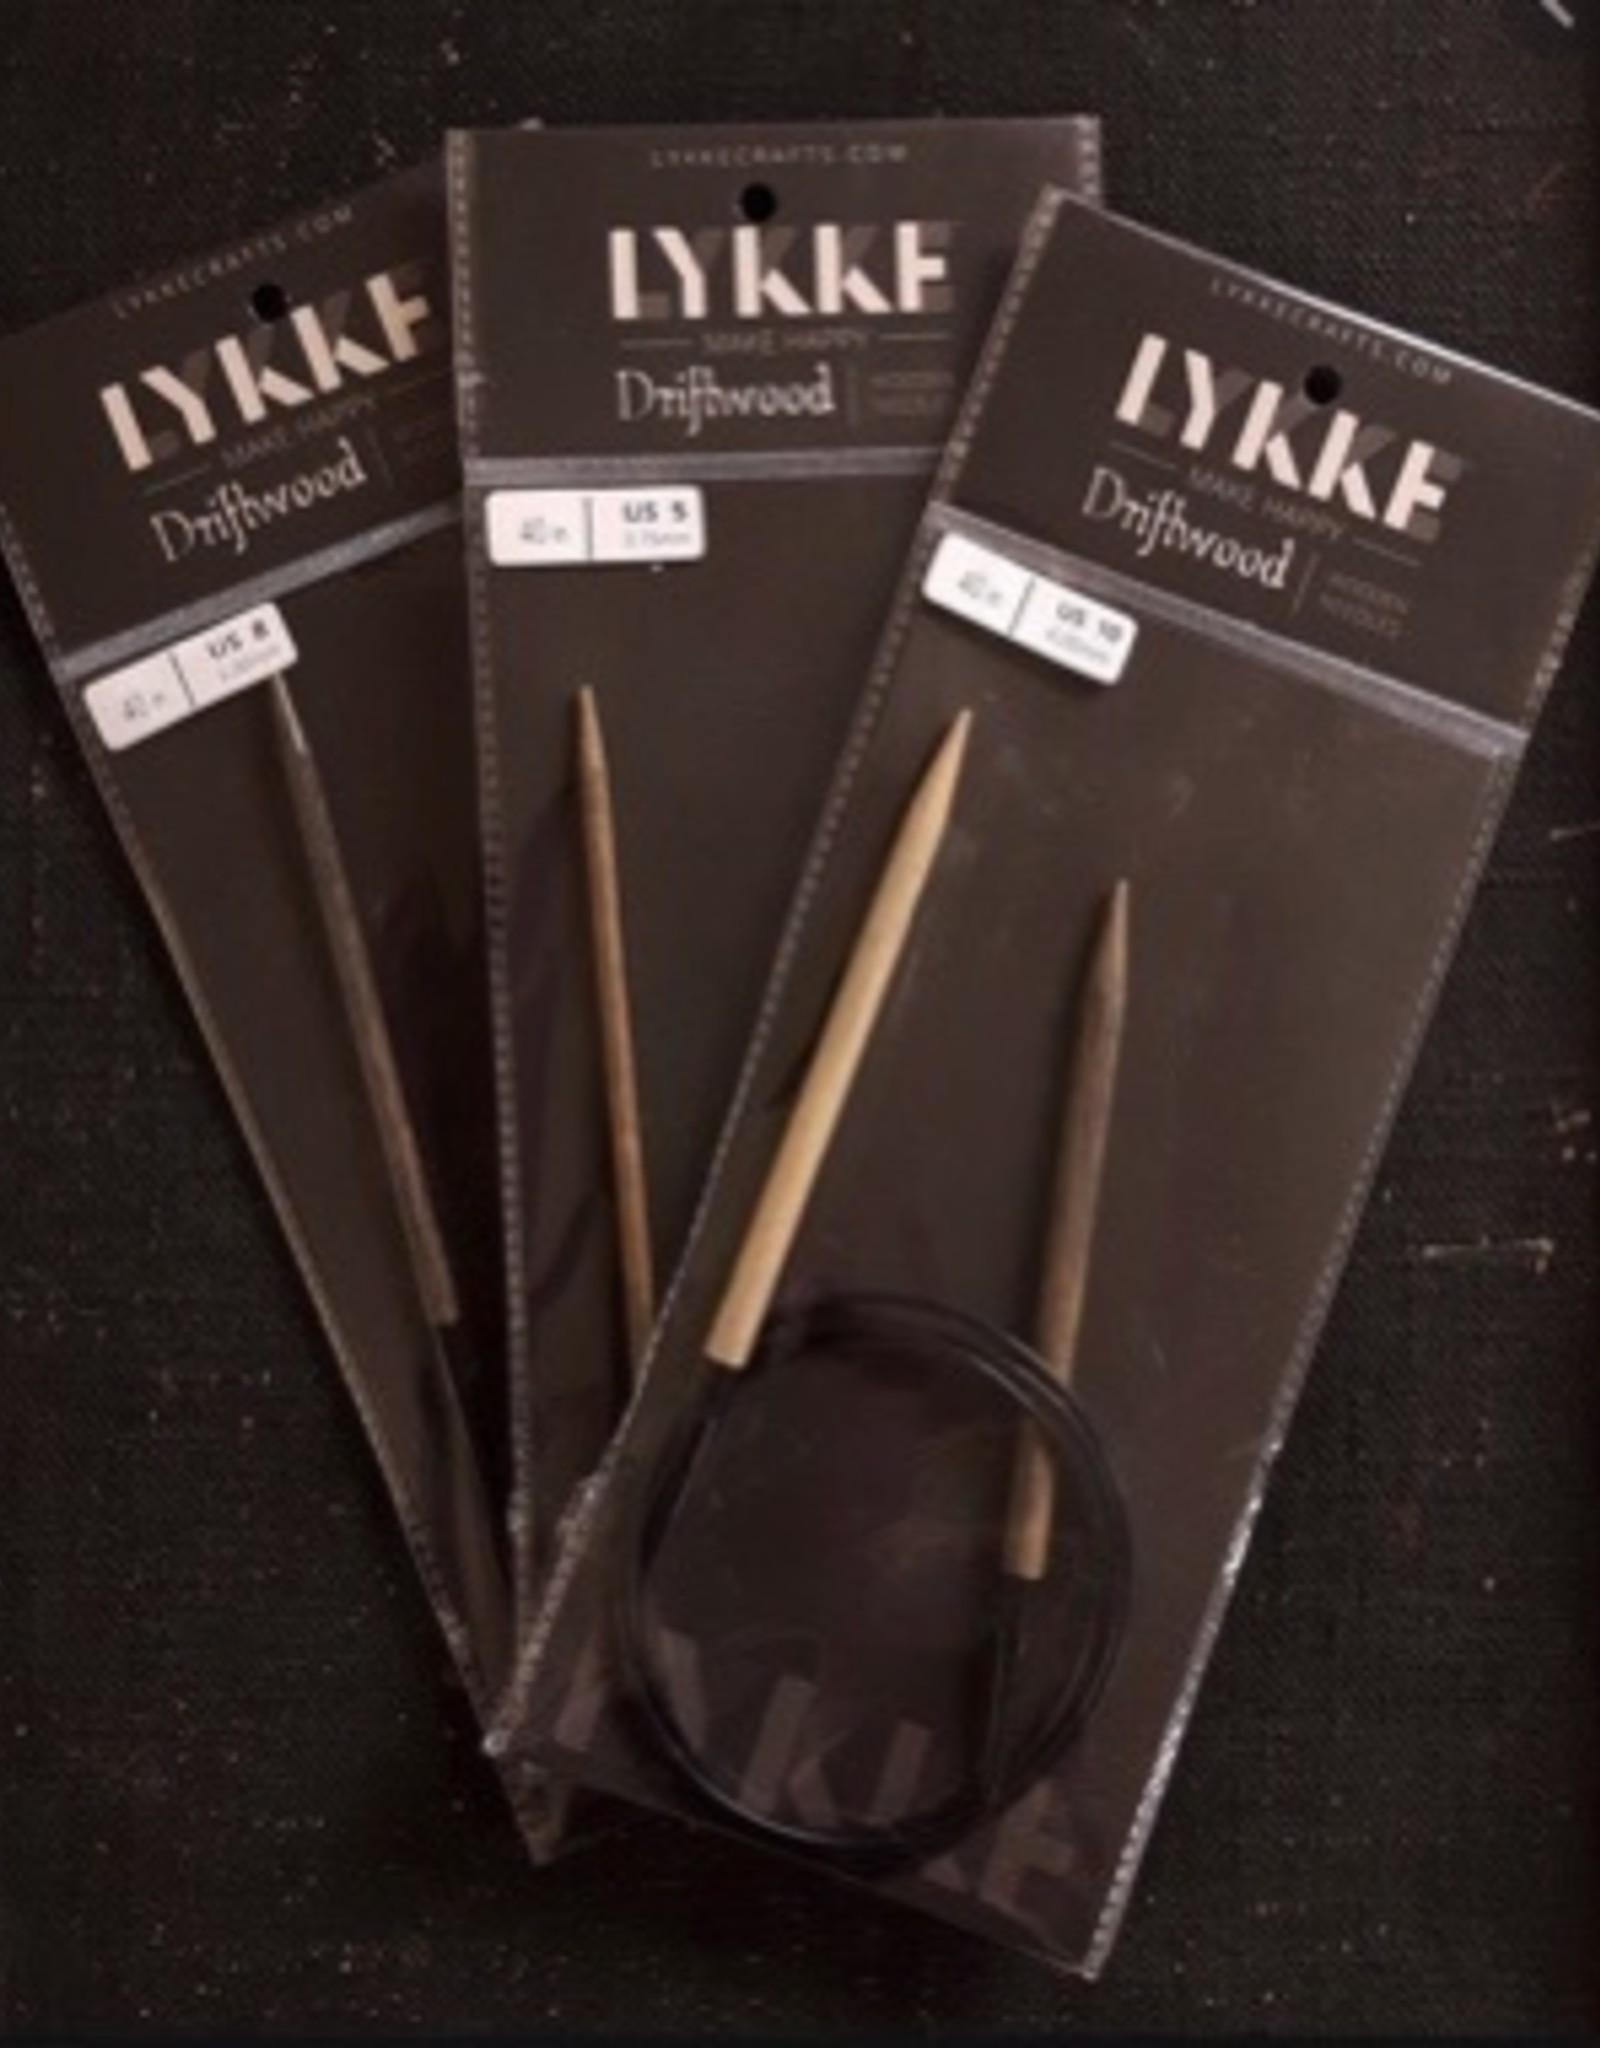 "Lykke Lykke Driftwood 12"" Circular Needles"